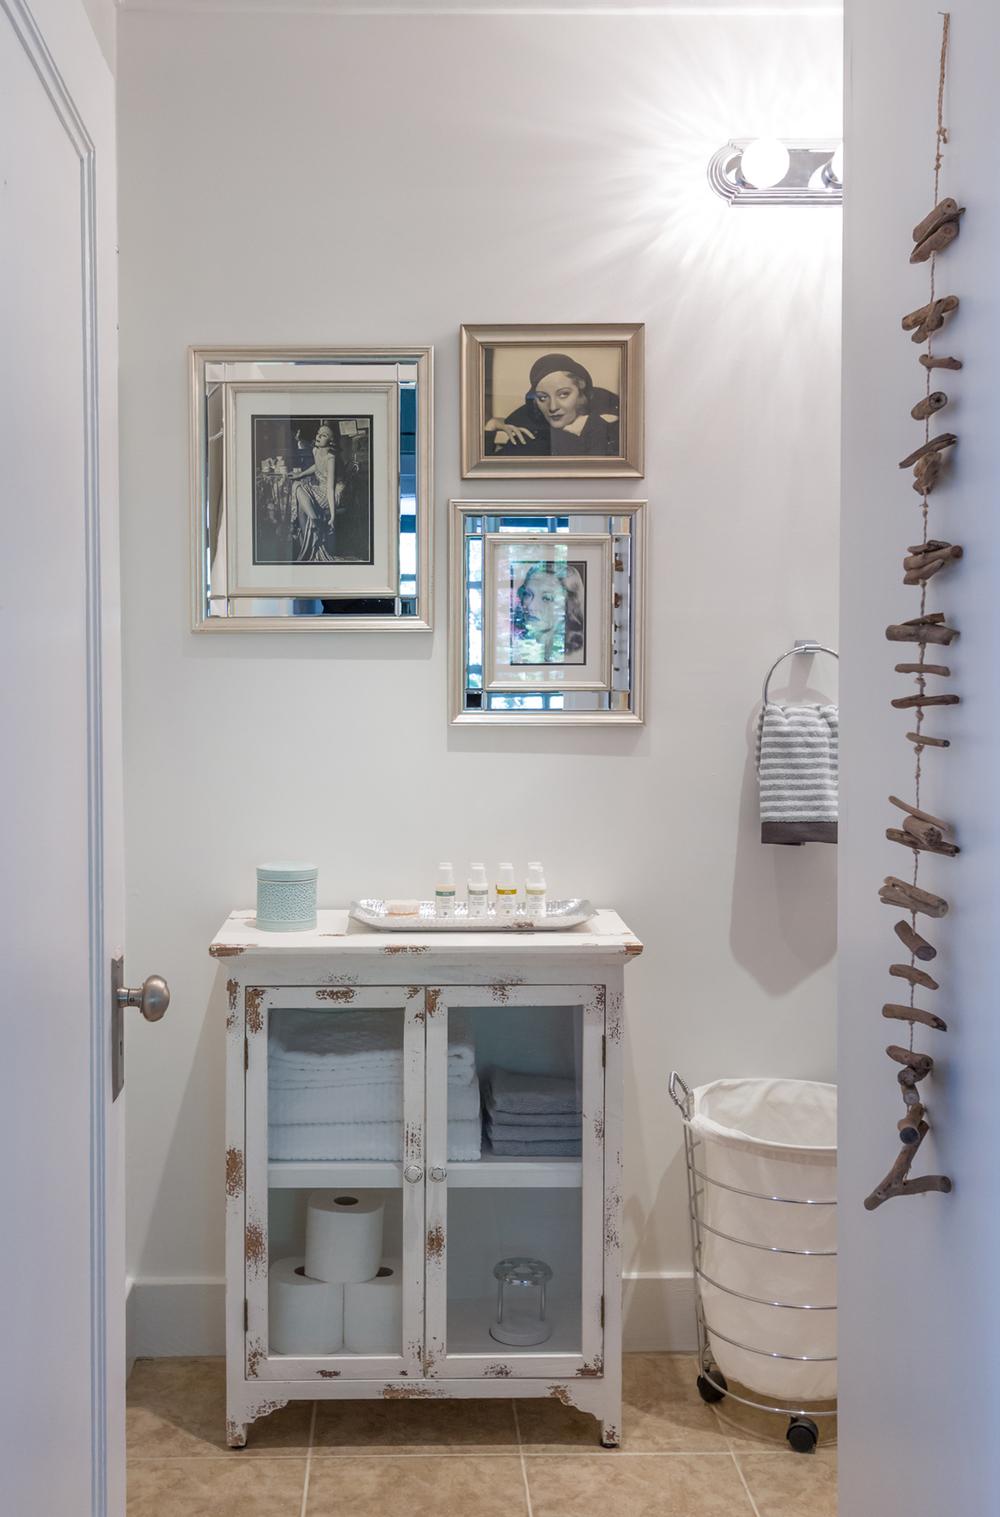 TS_Bathroom_Entrance.jpg